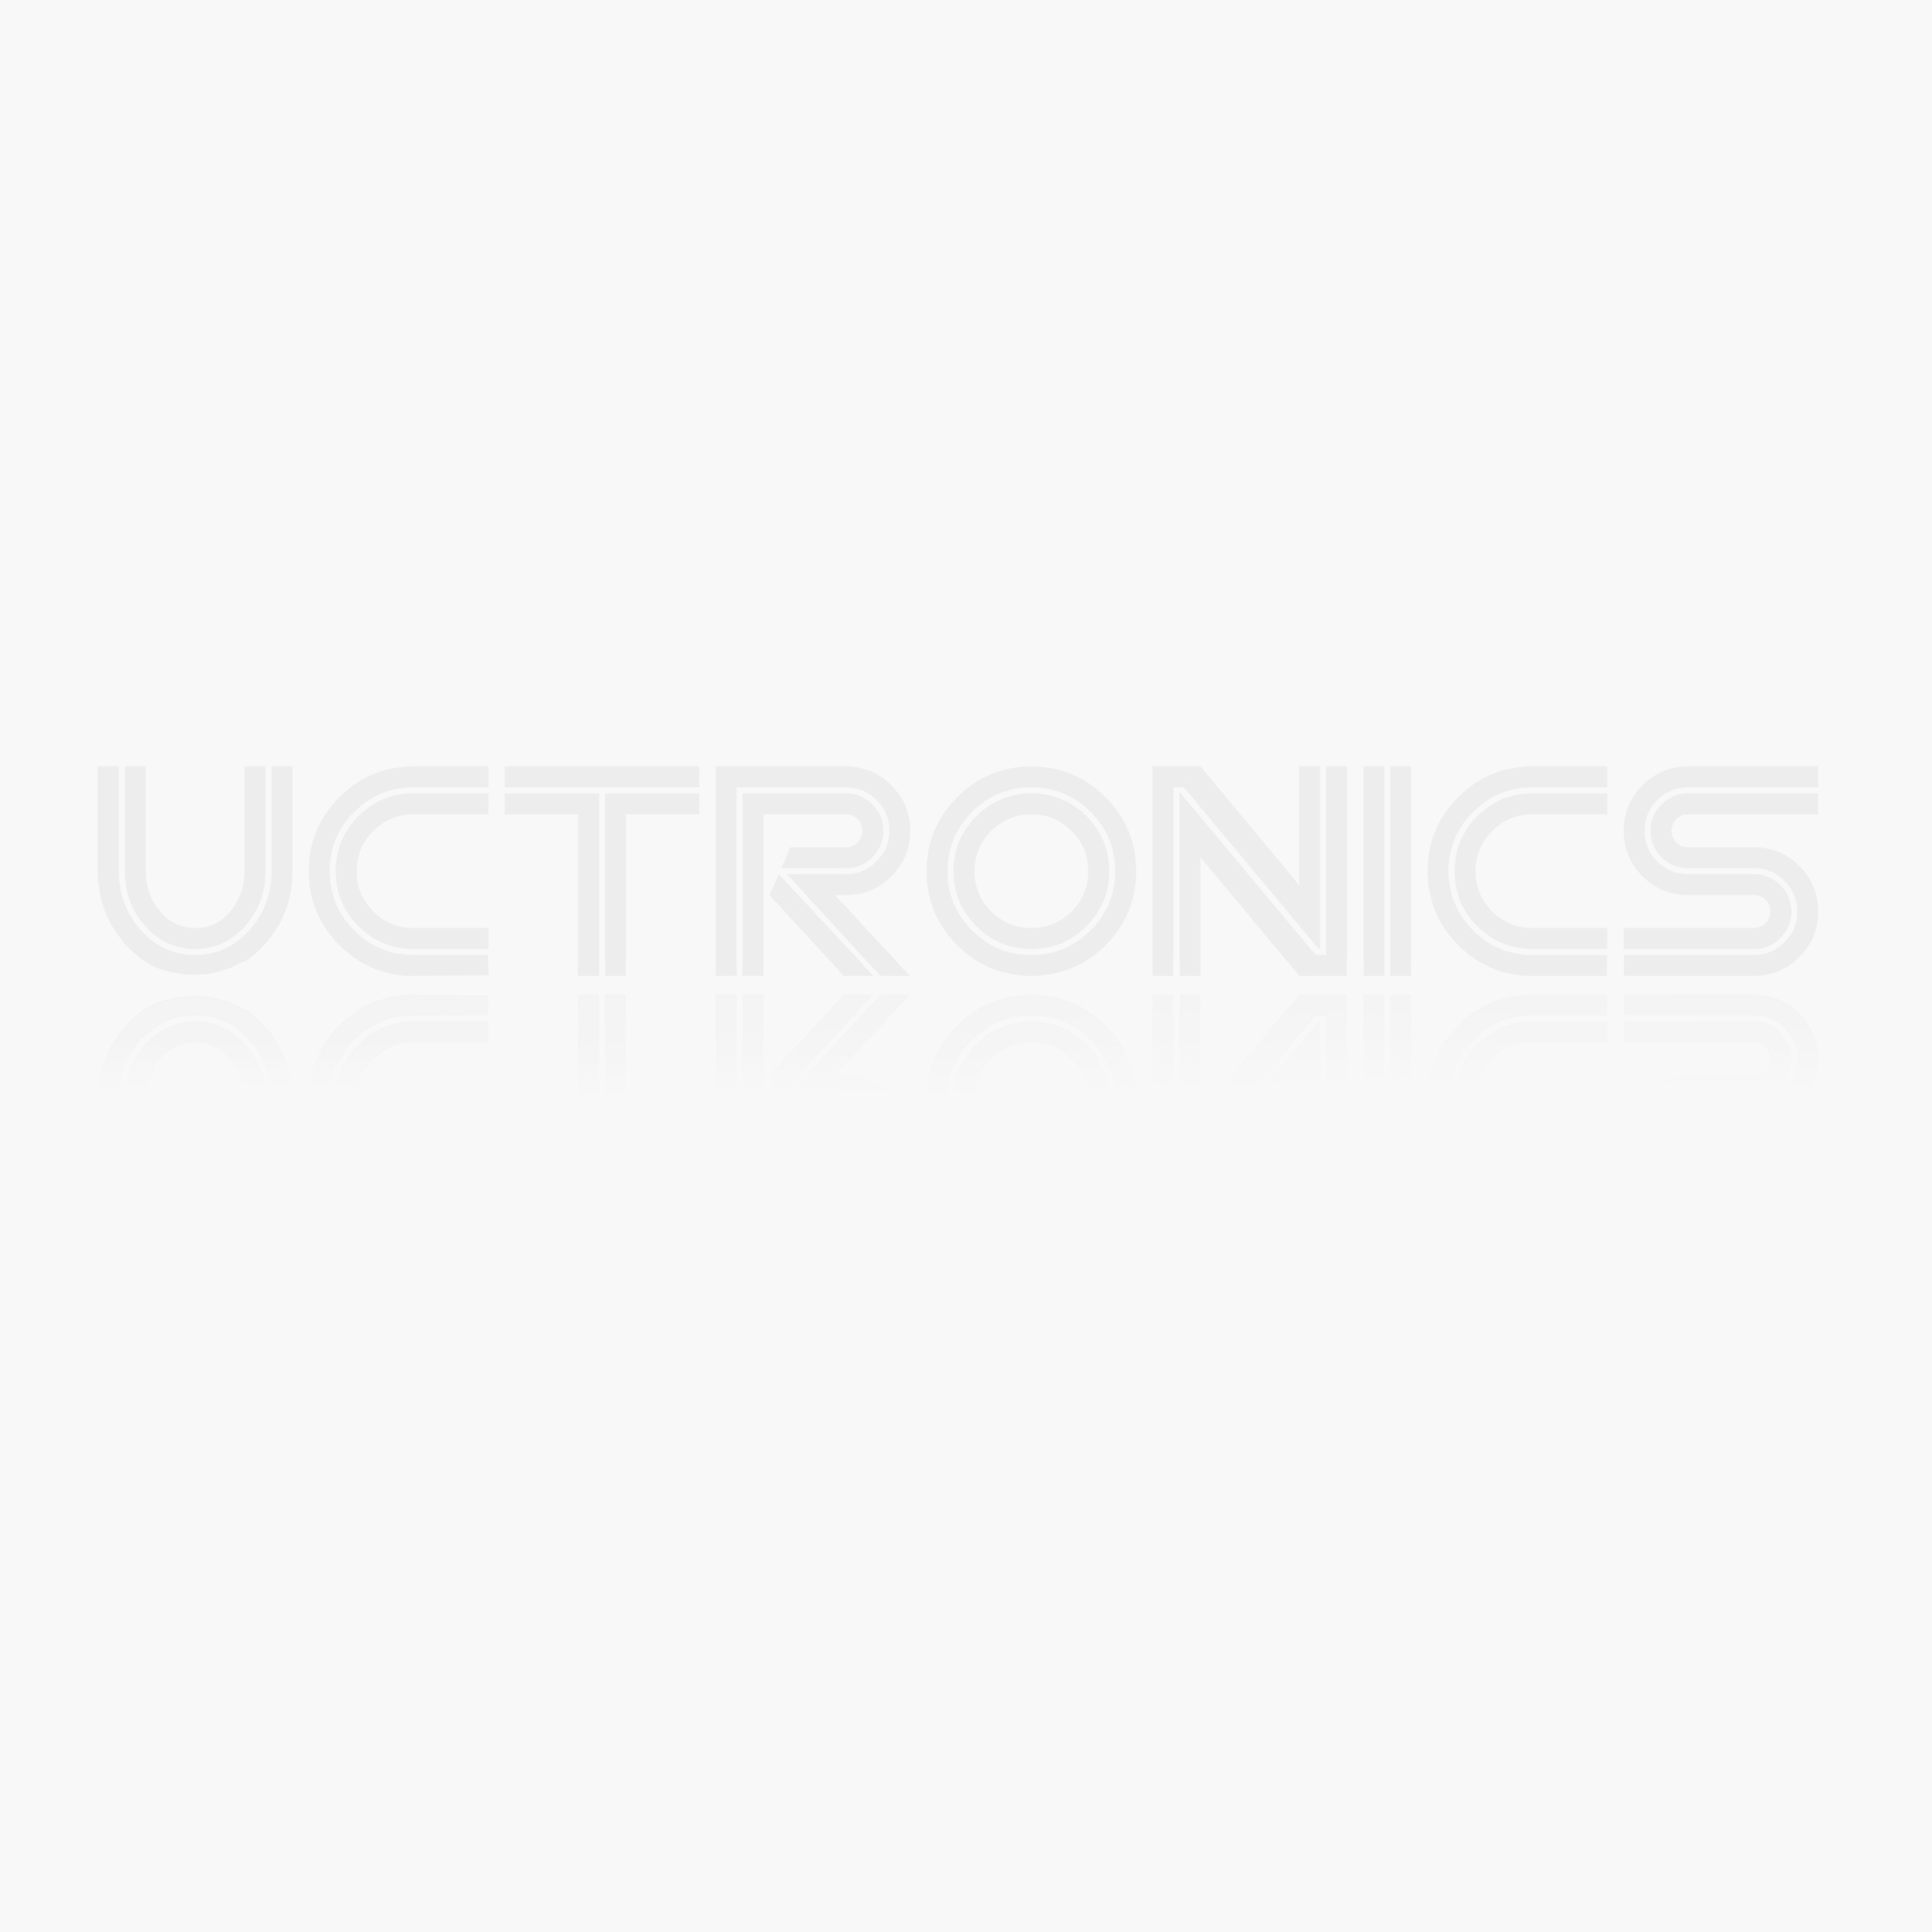 5pcs 74LS00 DIP-14 DIP 14pin Quad 2-Input NAND Gate IC Chip